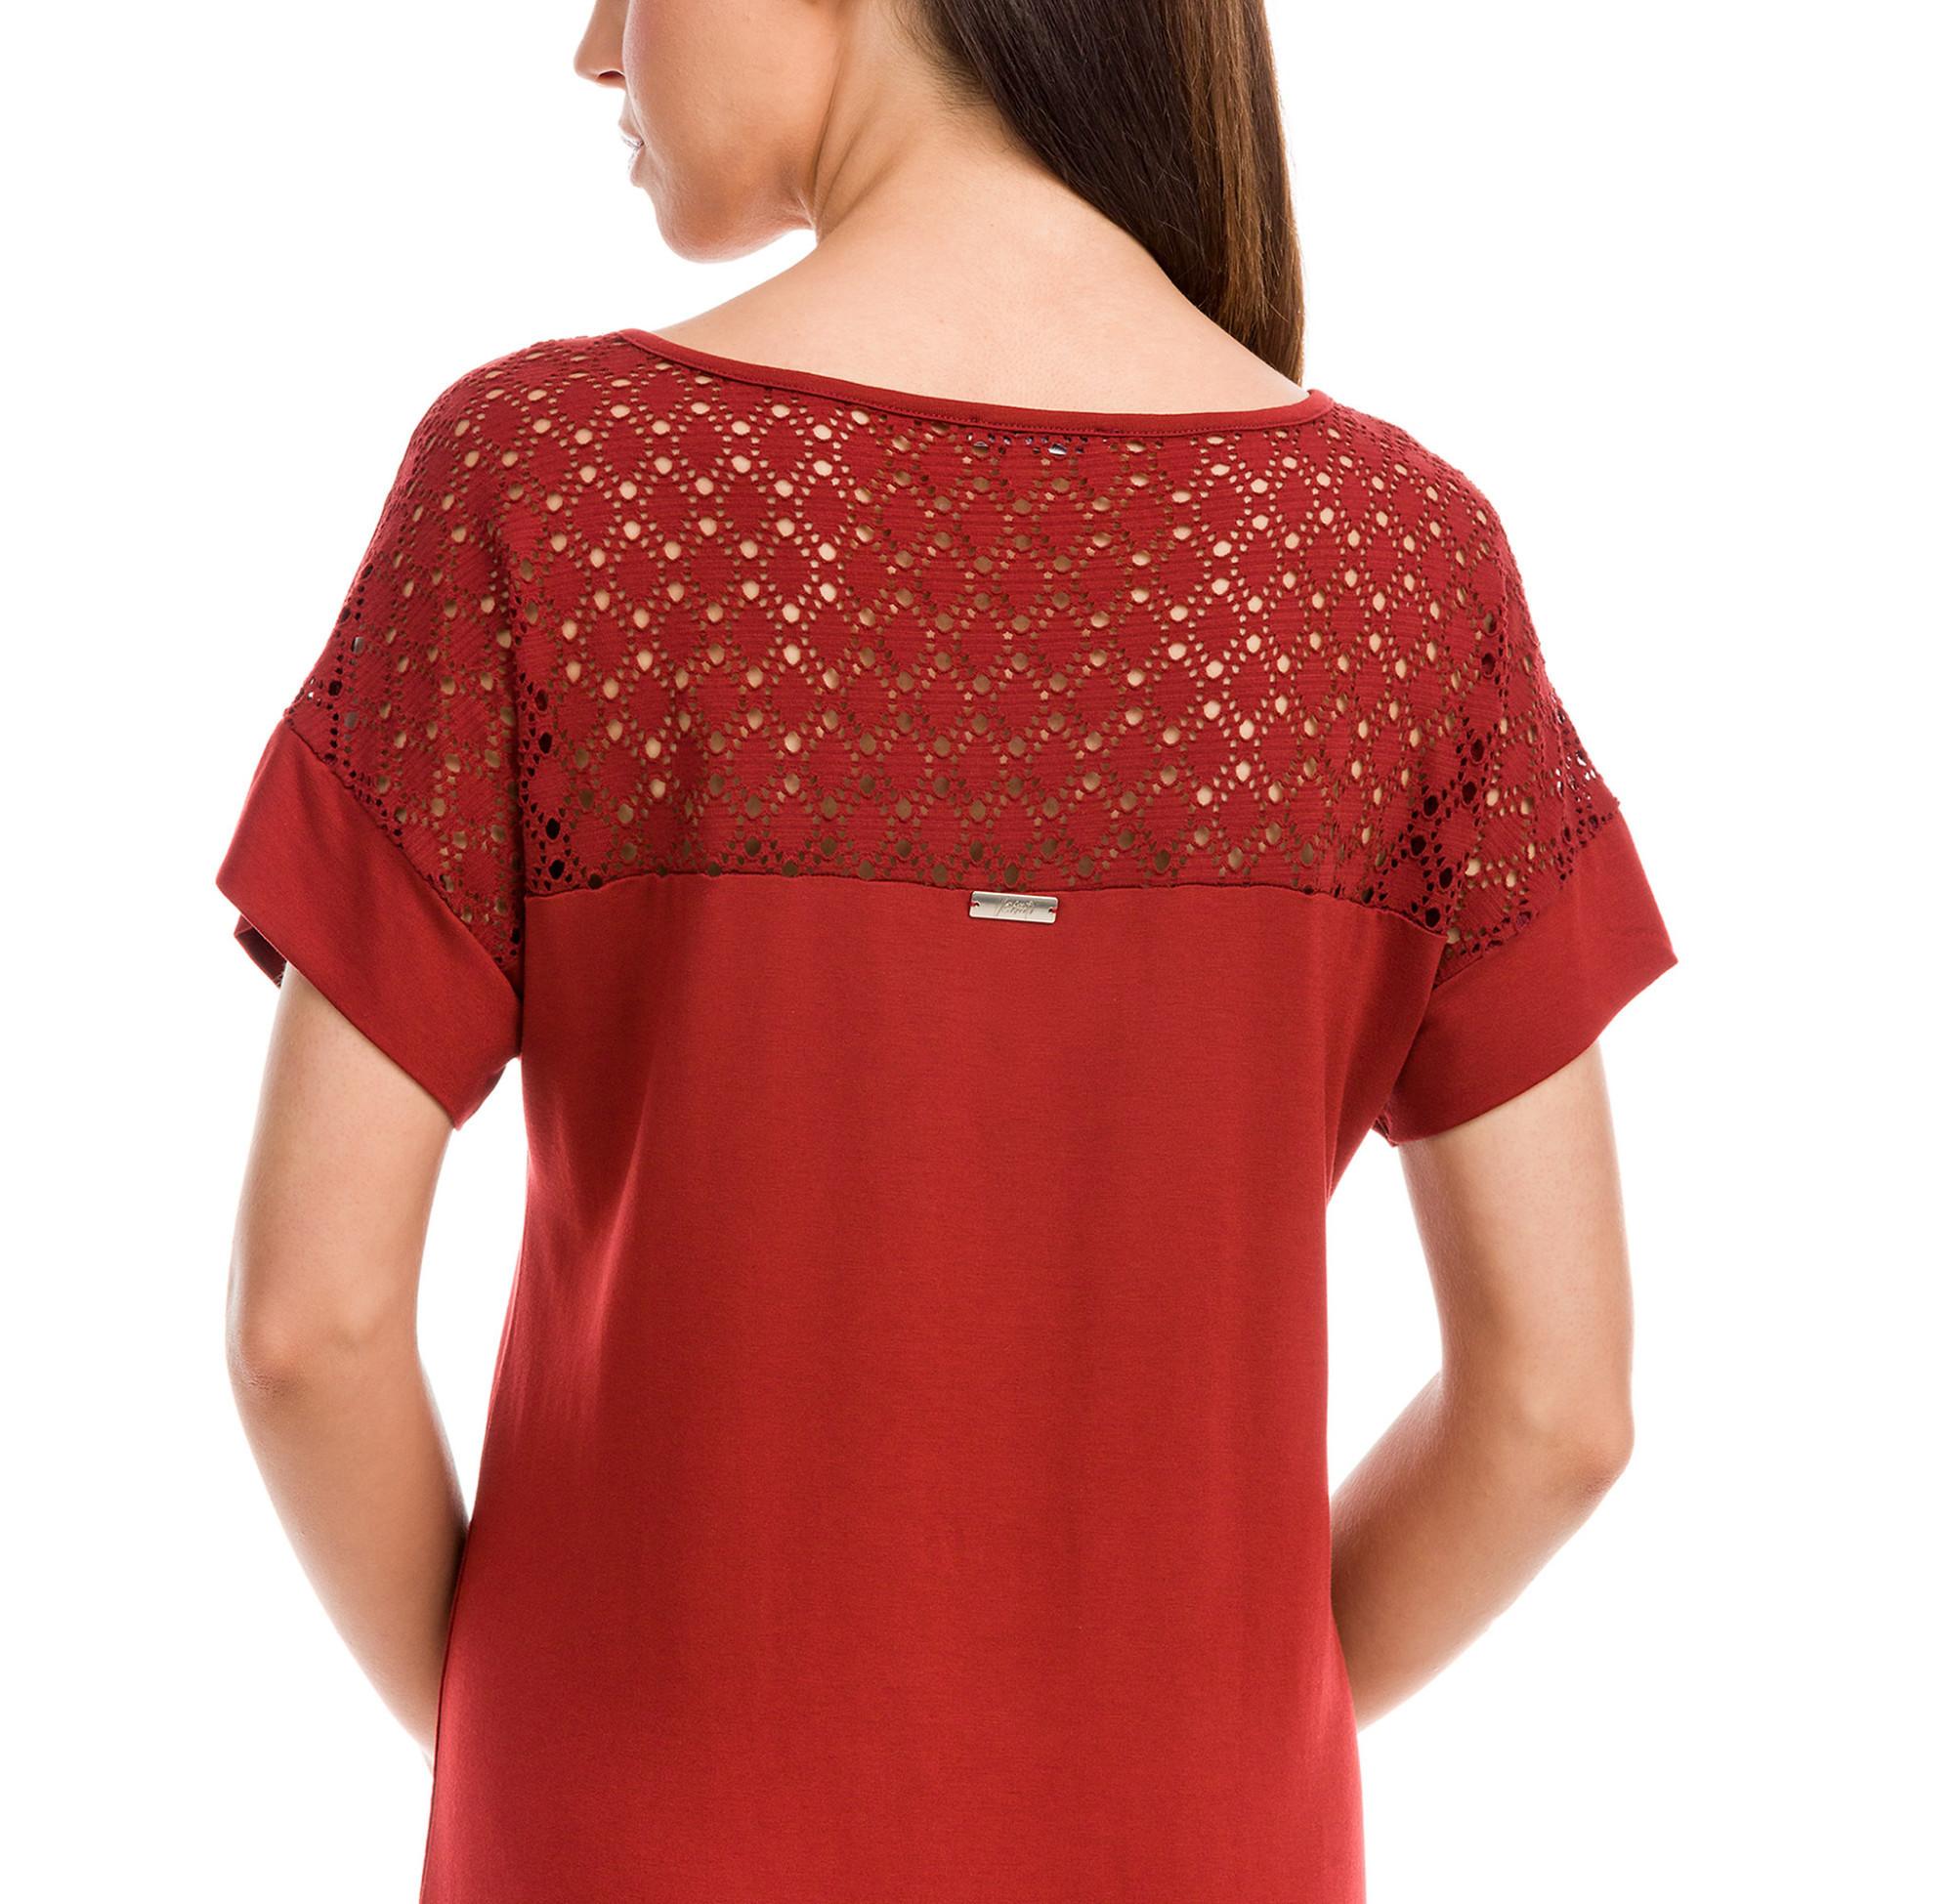 Vamp - Dámske šaty 12572 - Vamp red terracota s